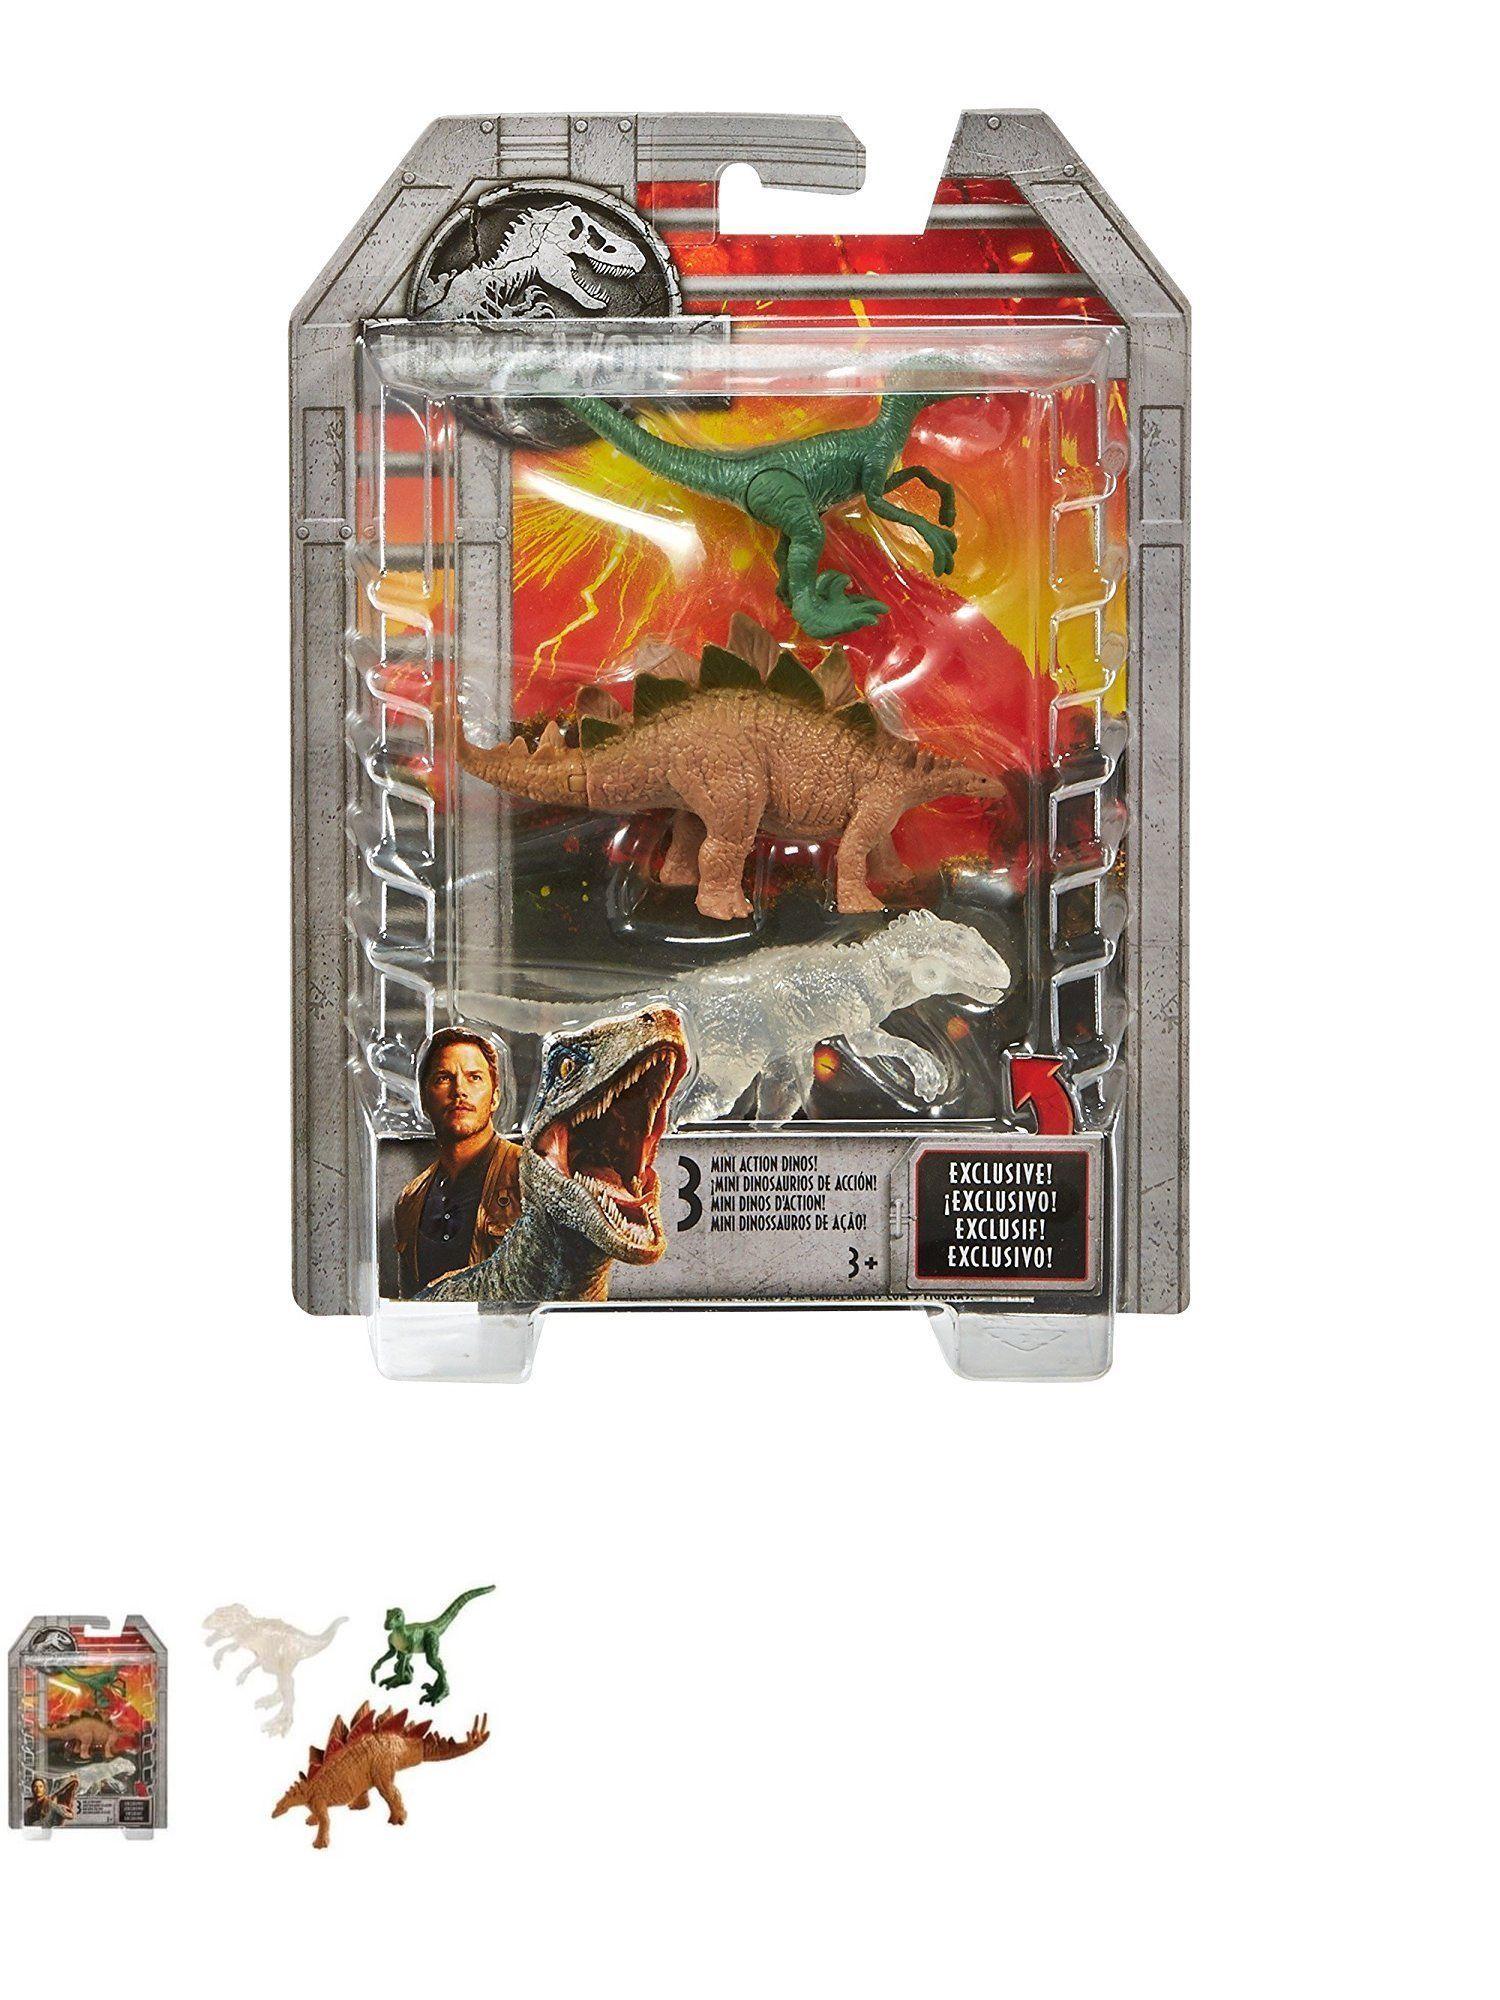 Animals and Dinosaurs 175692 Jurassic World Stegosaurus